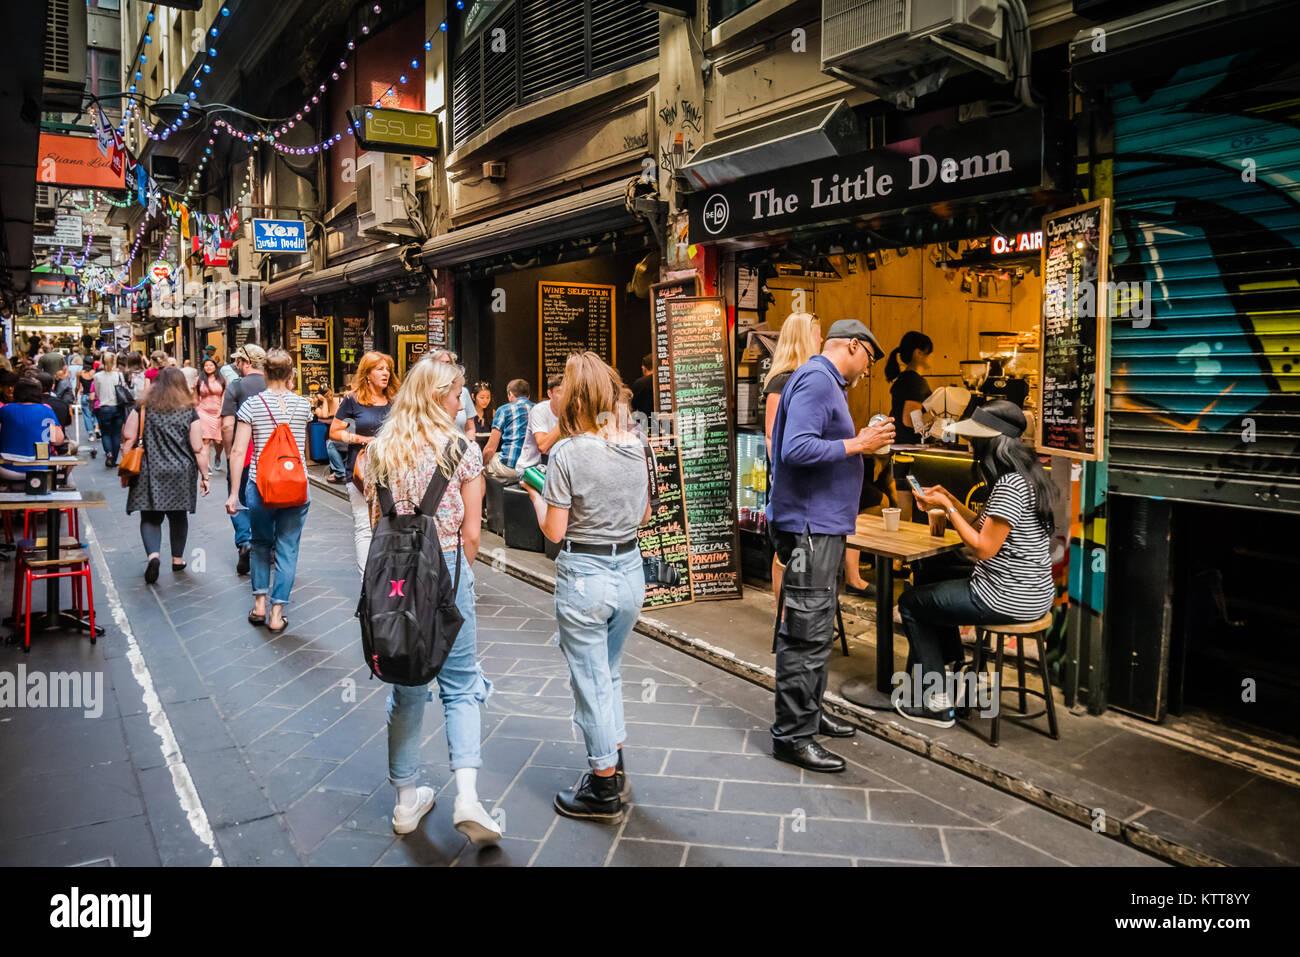 melbourne collins street - Stock Image